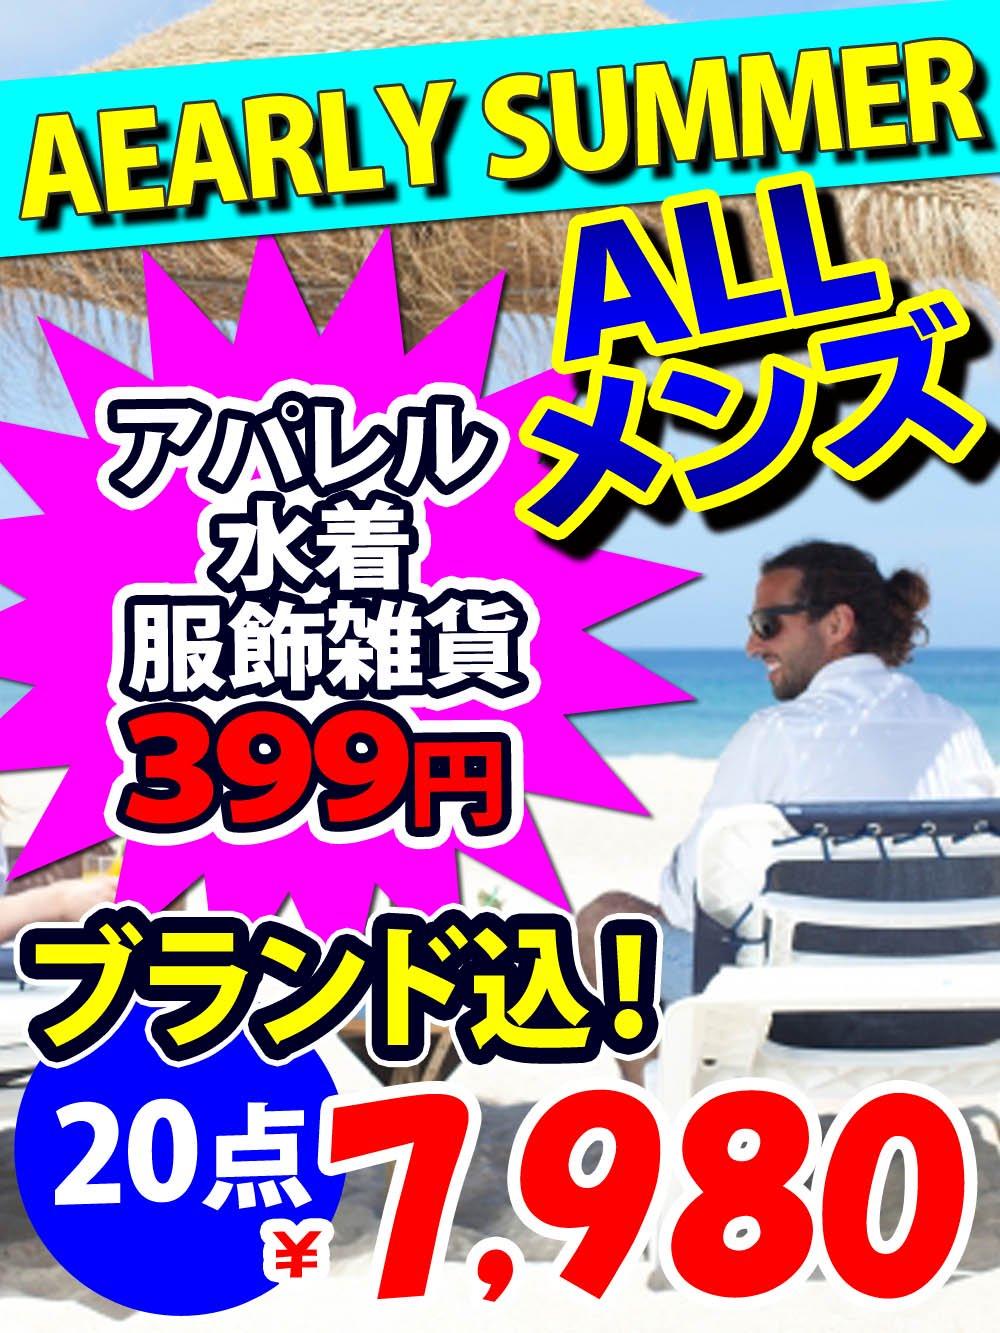 【ALLメンズ】EARLY SUMMER ブランド込 アパレル 水着 服飾雑貨【20点】@399